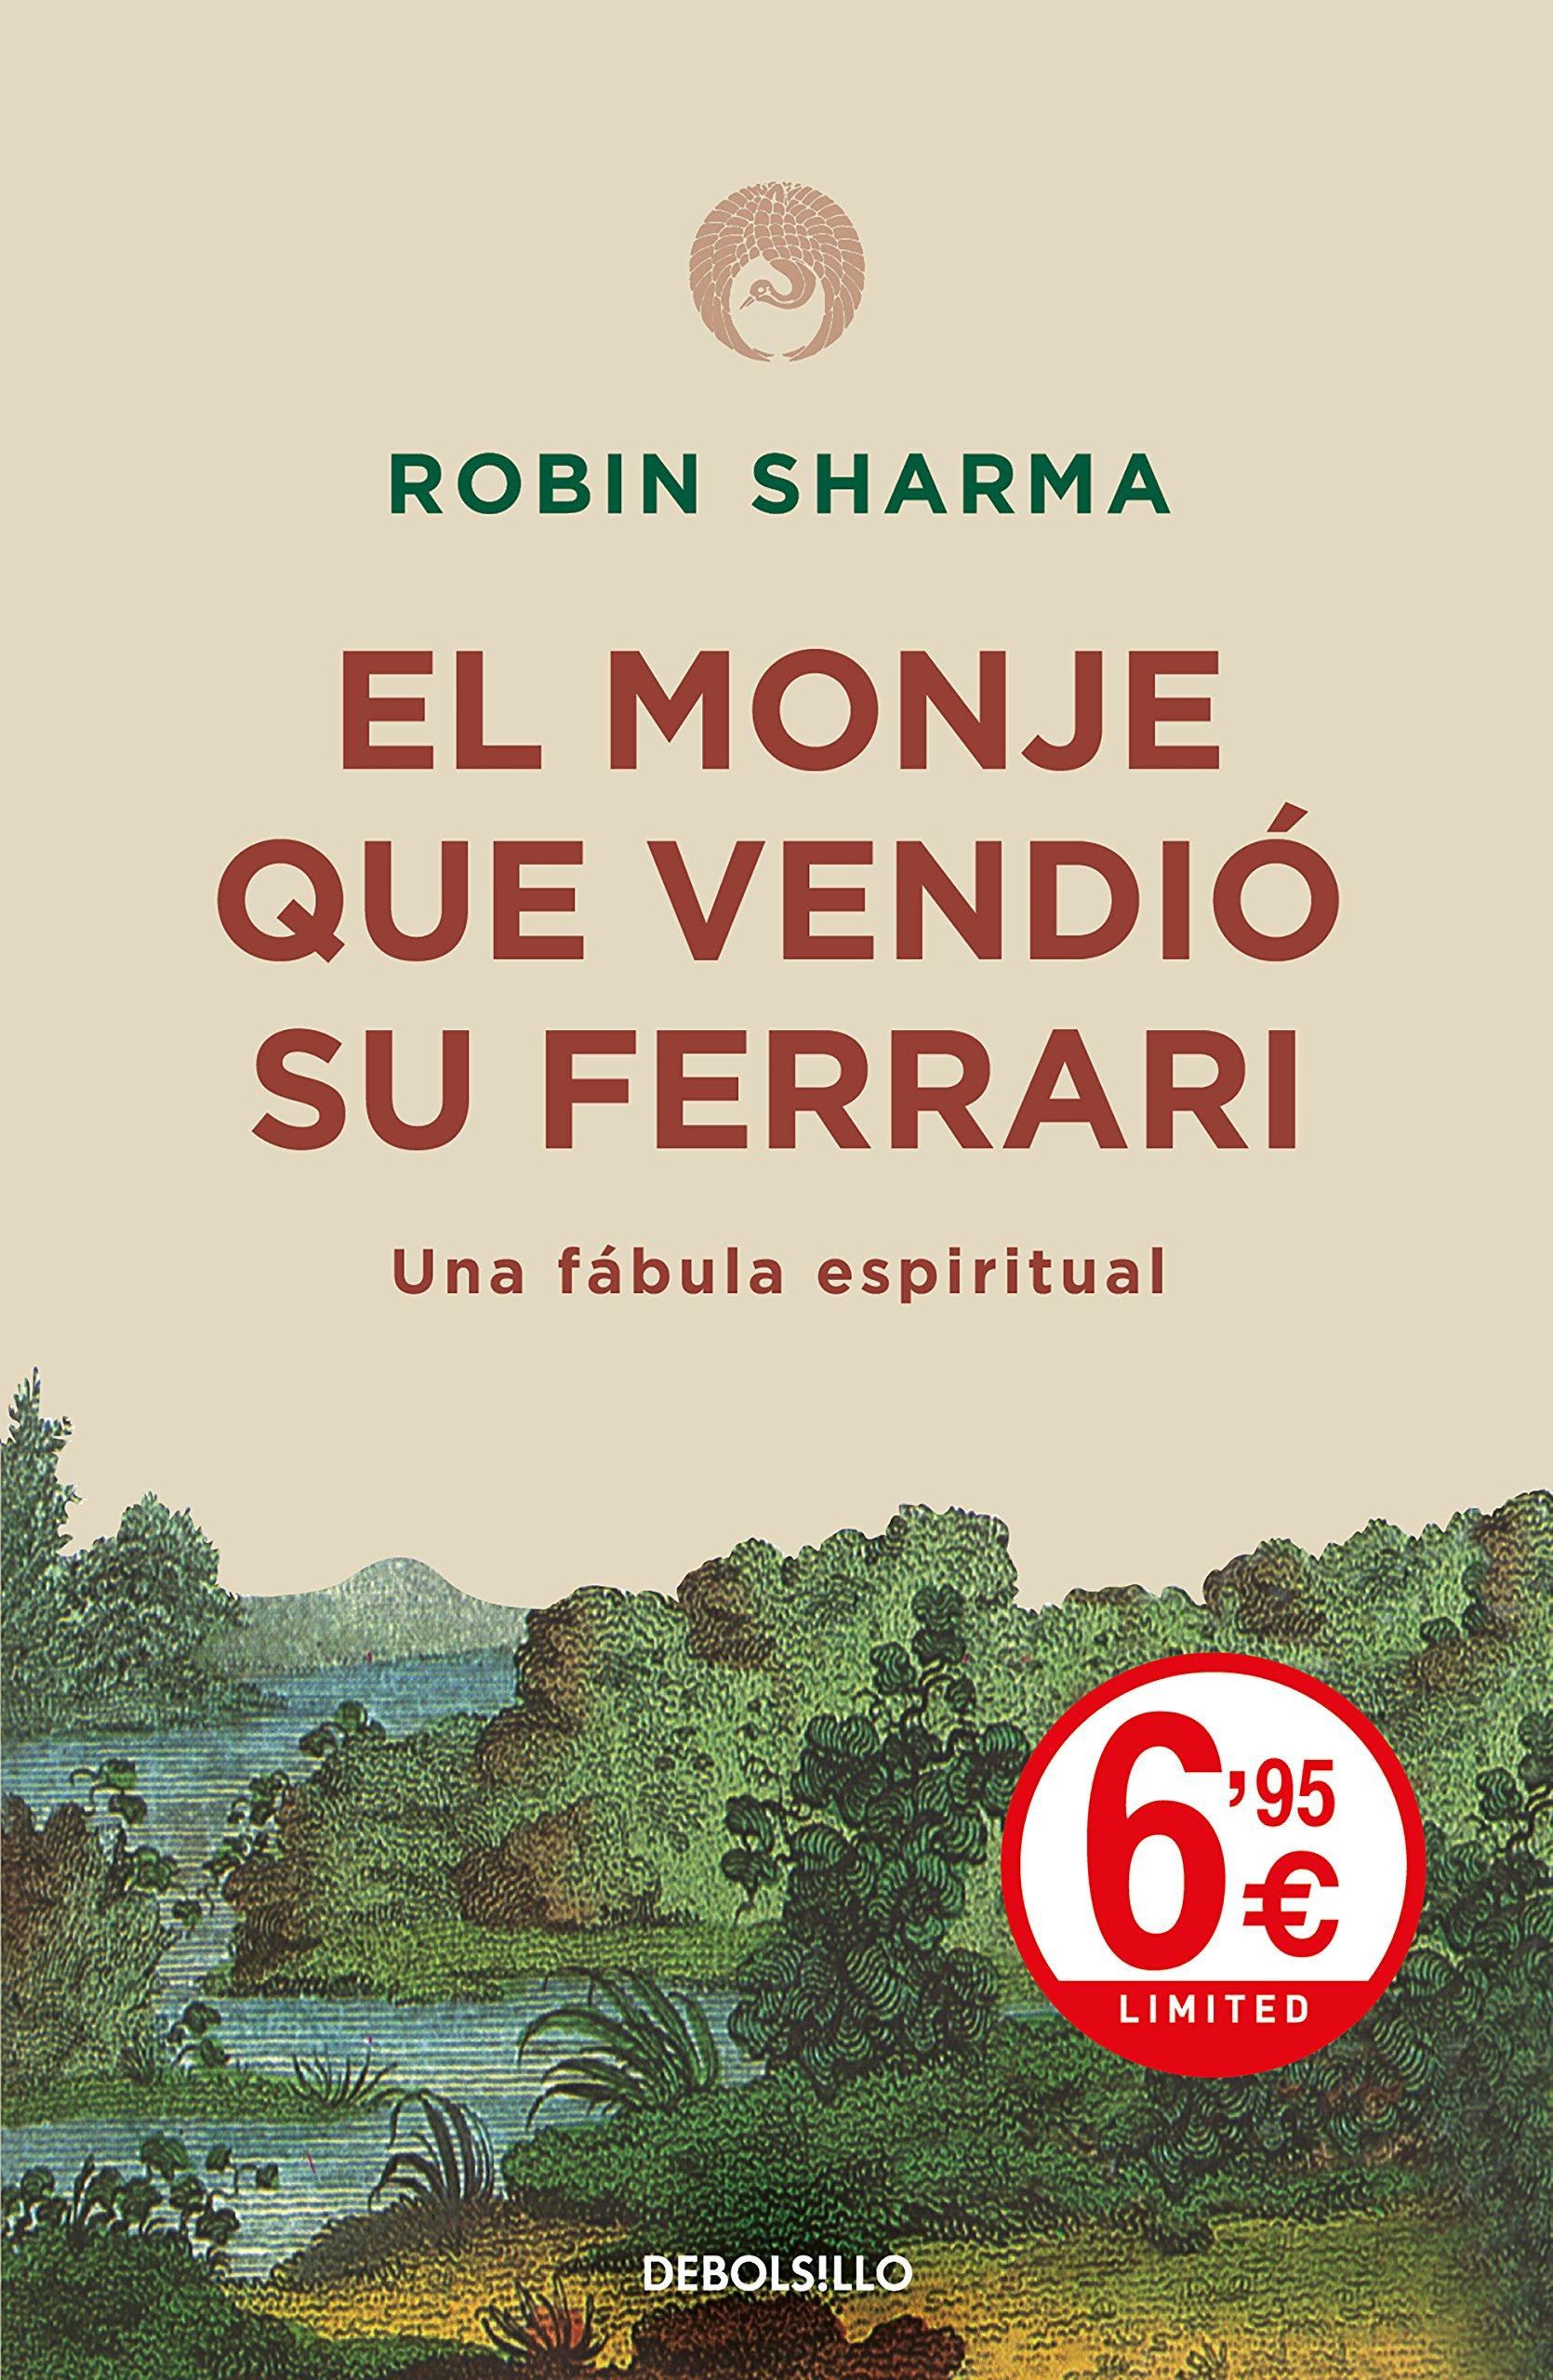 El monje que vendió su Ferrari: Una fábula espiritual CAMPAÑAS: Amazon.es:  Robin Sharma, Pedro Fontana;: Libros